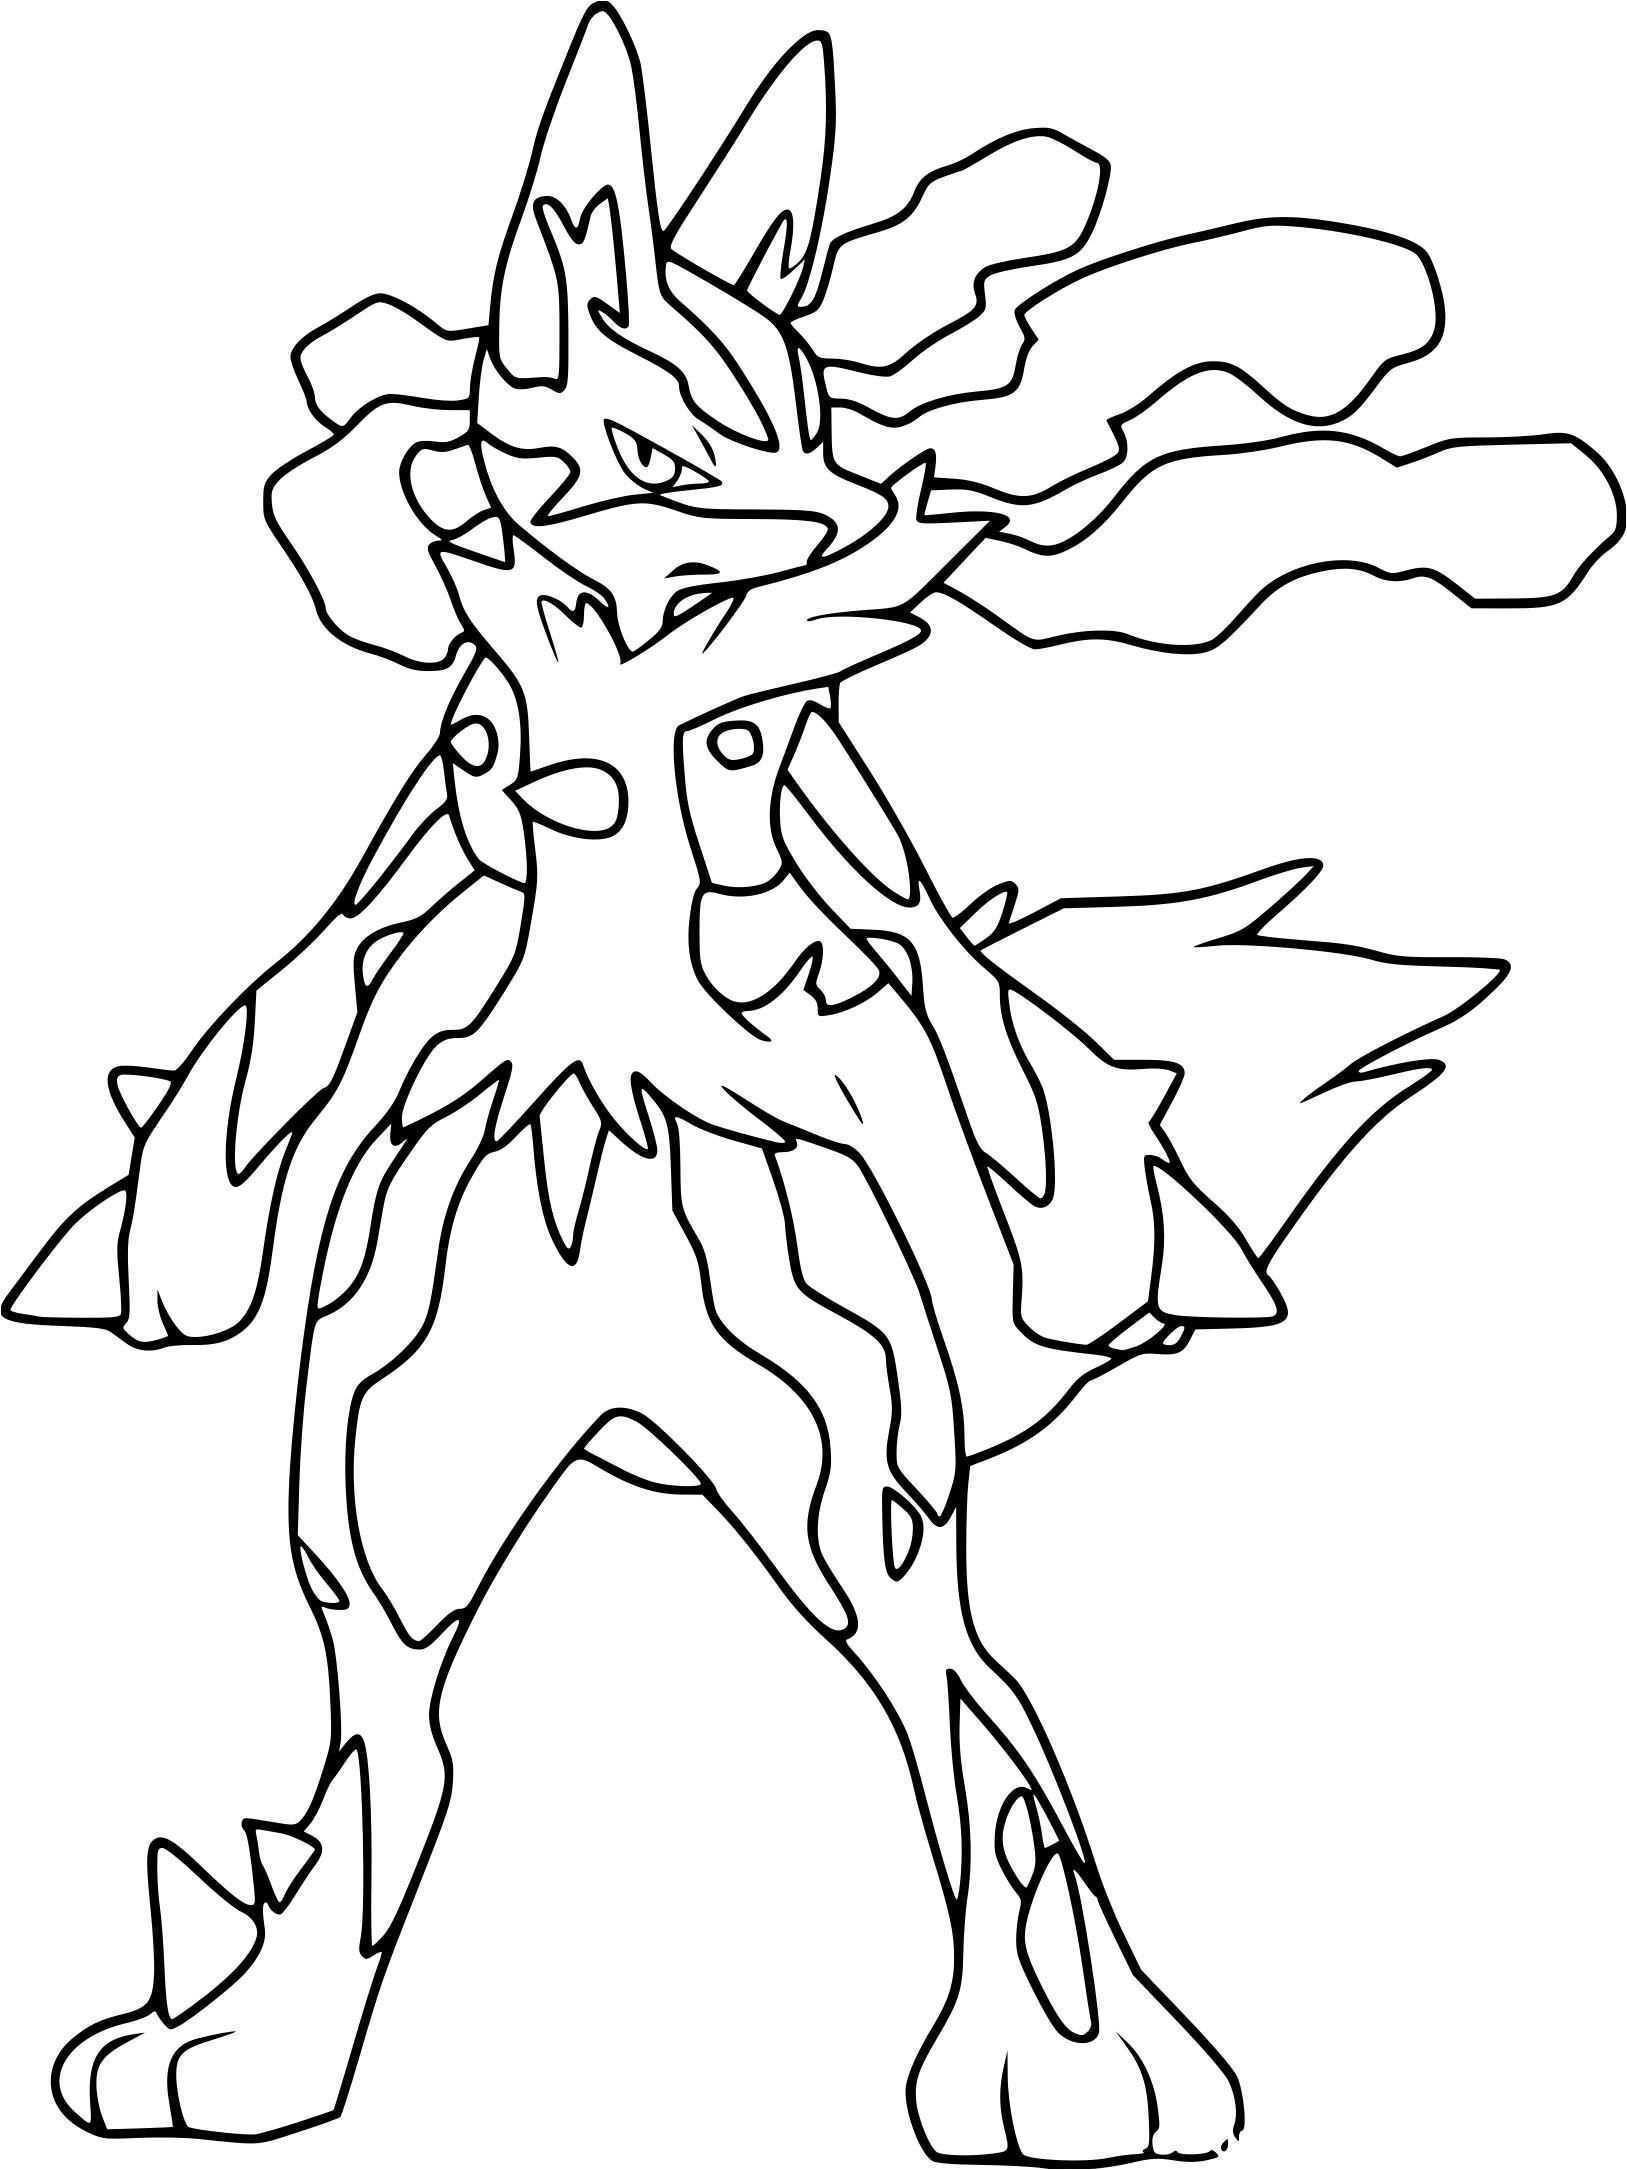 Coloriage Pokemon Mega Evolution A Colorier Dessin A Imprimer In 2021 Pokemon Coloring Pokemon Coloring Sheets Pokemon Coloring Pages